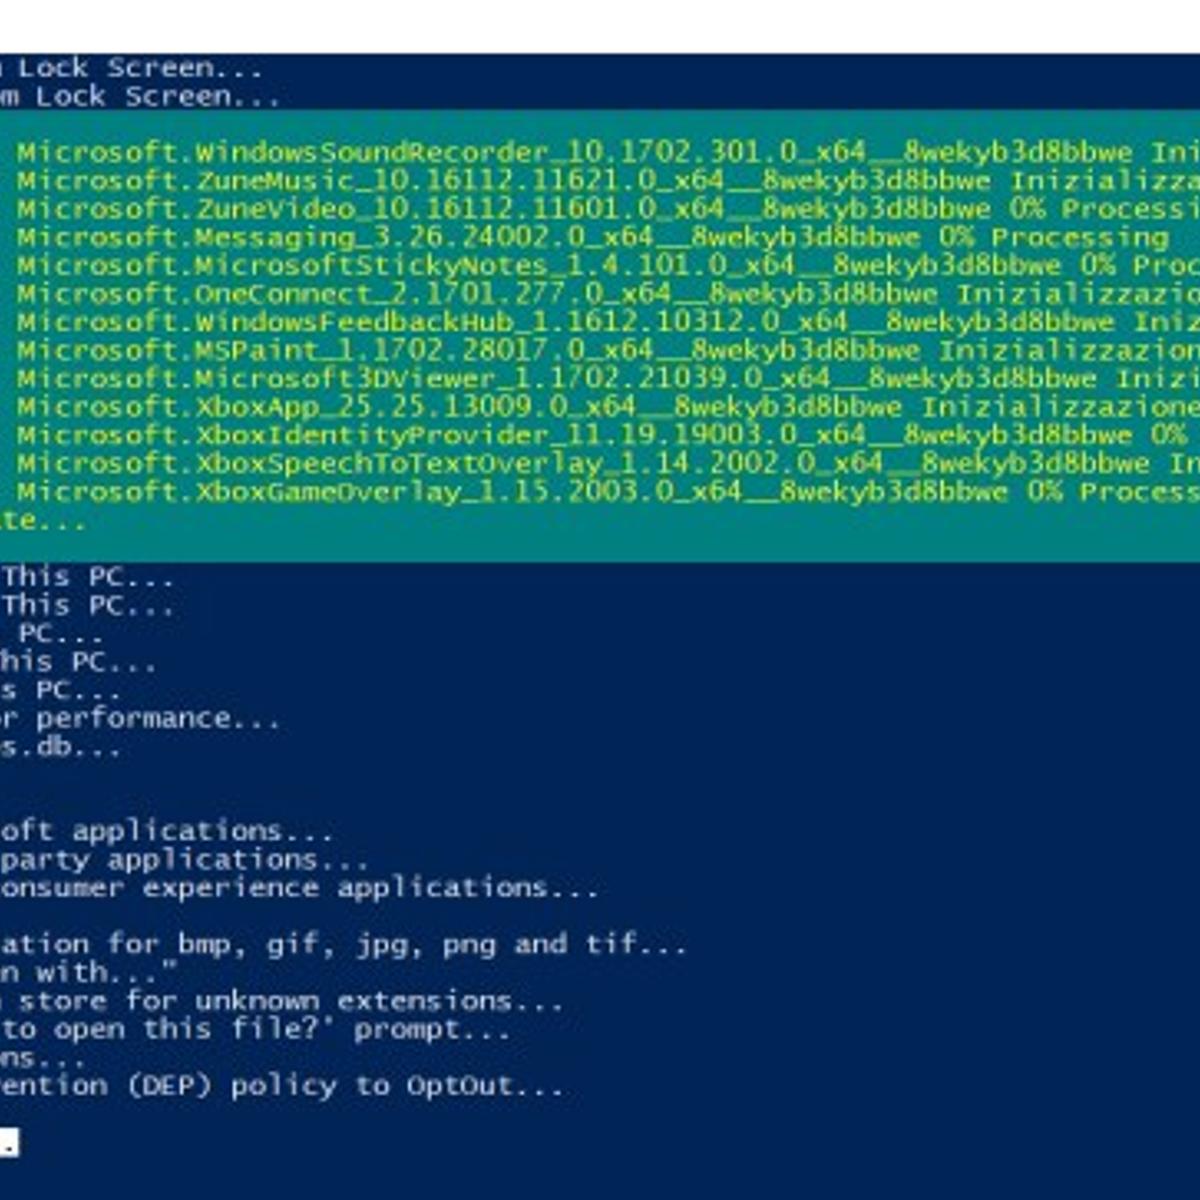 Win10-Initial-Setup-Script Alternatives and Similar Software